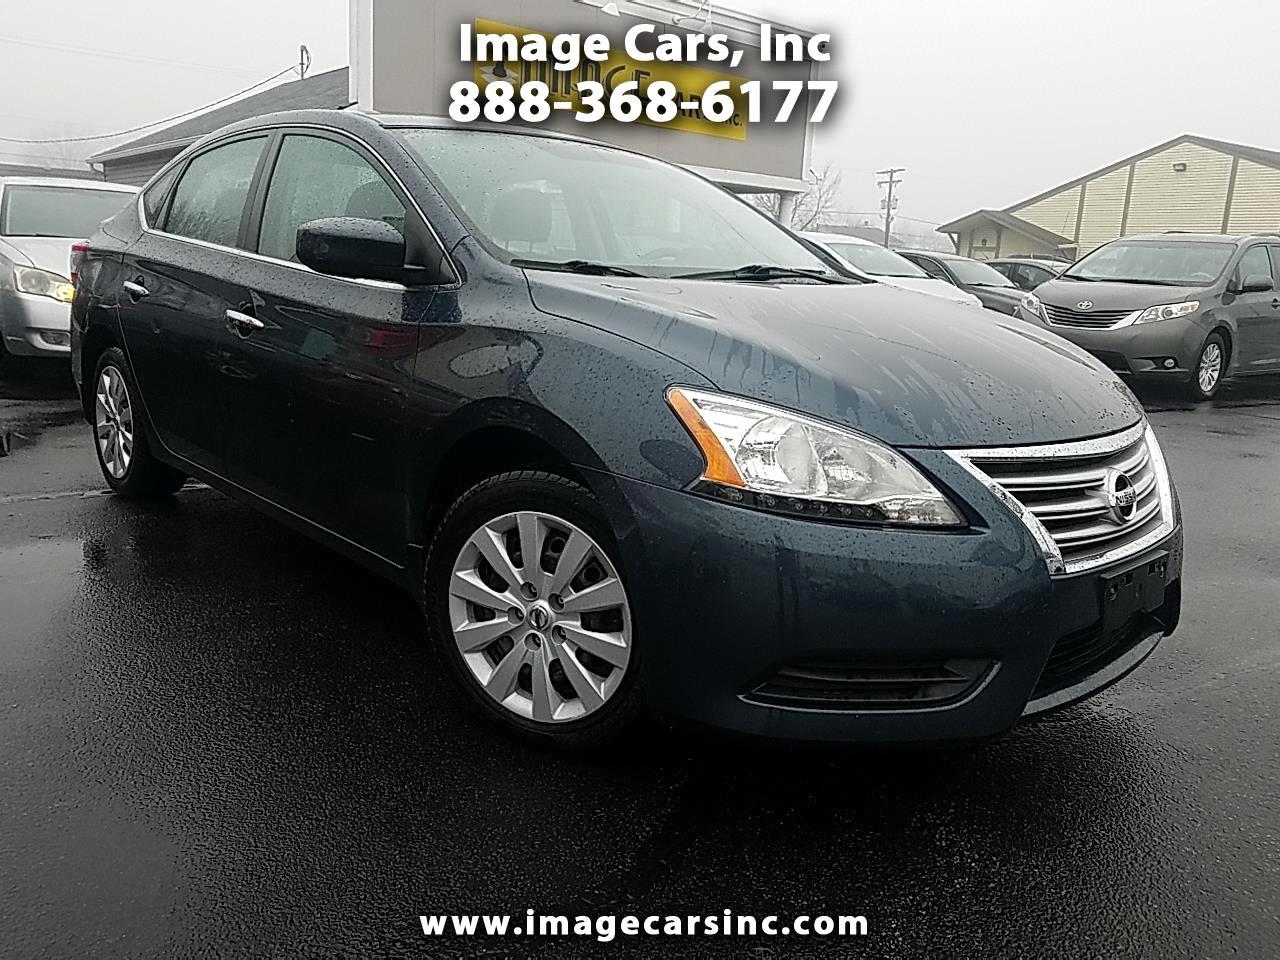 Nissan Fort Wayne >> Used 2013 Nissan Sentra For Sale In Fort Wayne In 46808 Image Cars Inc